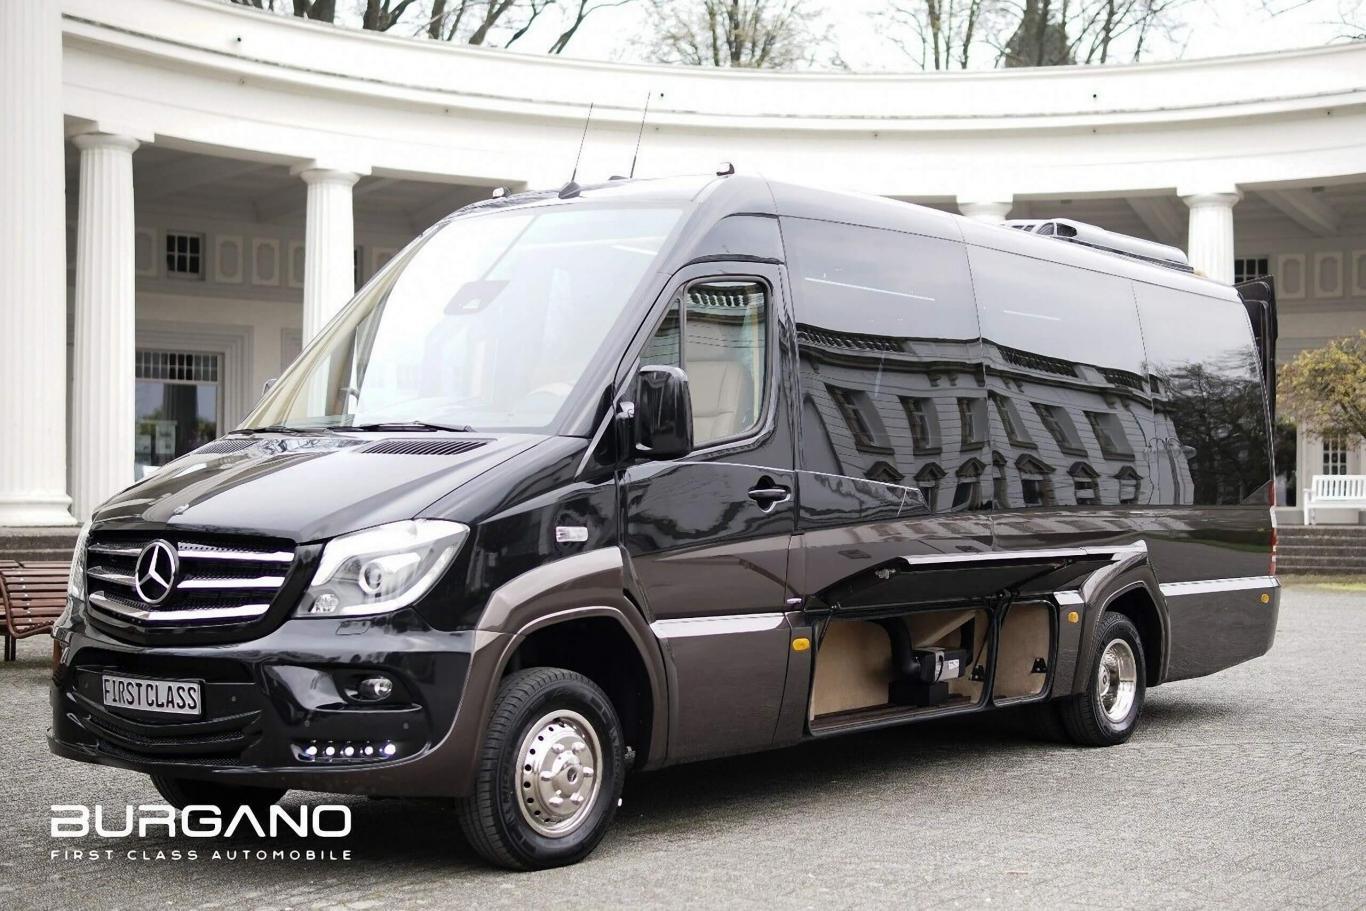 4X4 Sprinter Van For Sale >> Mercedes Benz Sprinter 519 4x4 Luxury First Class Van 319 Vip